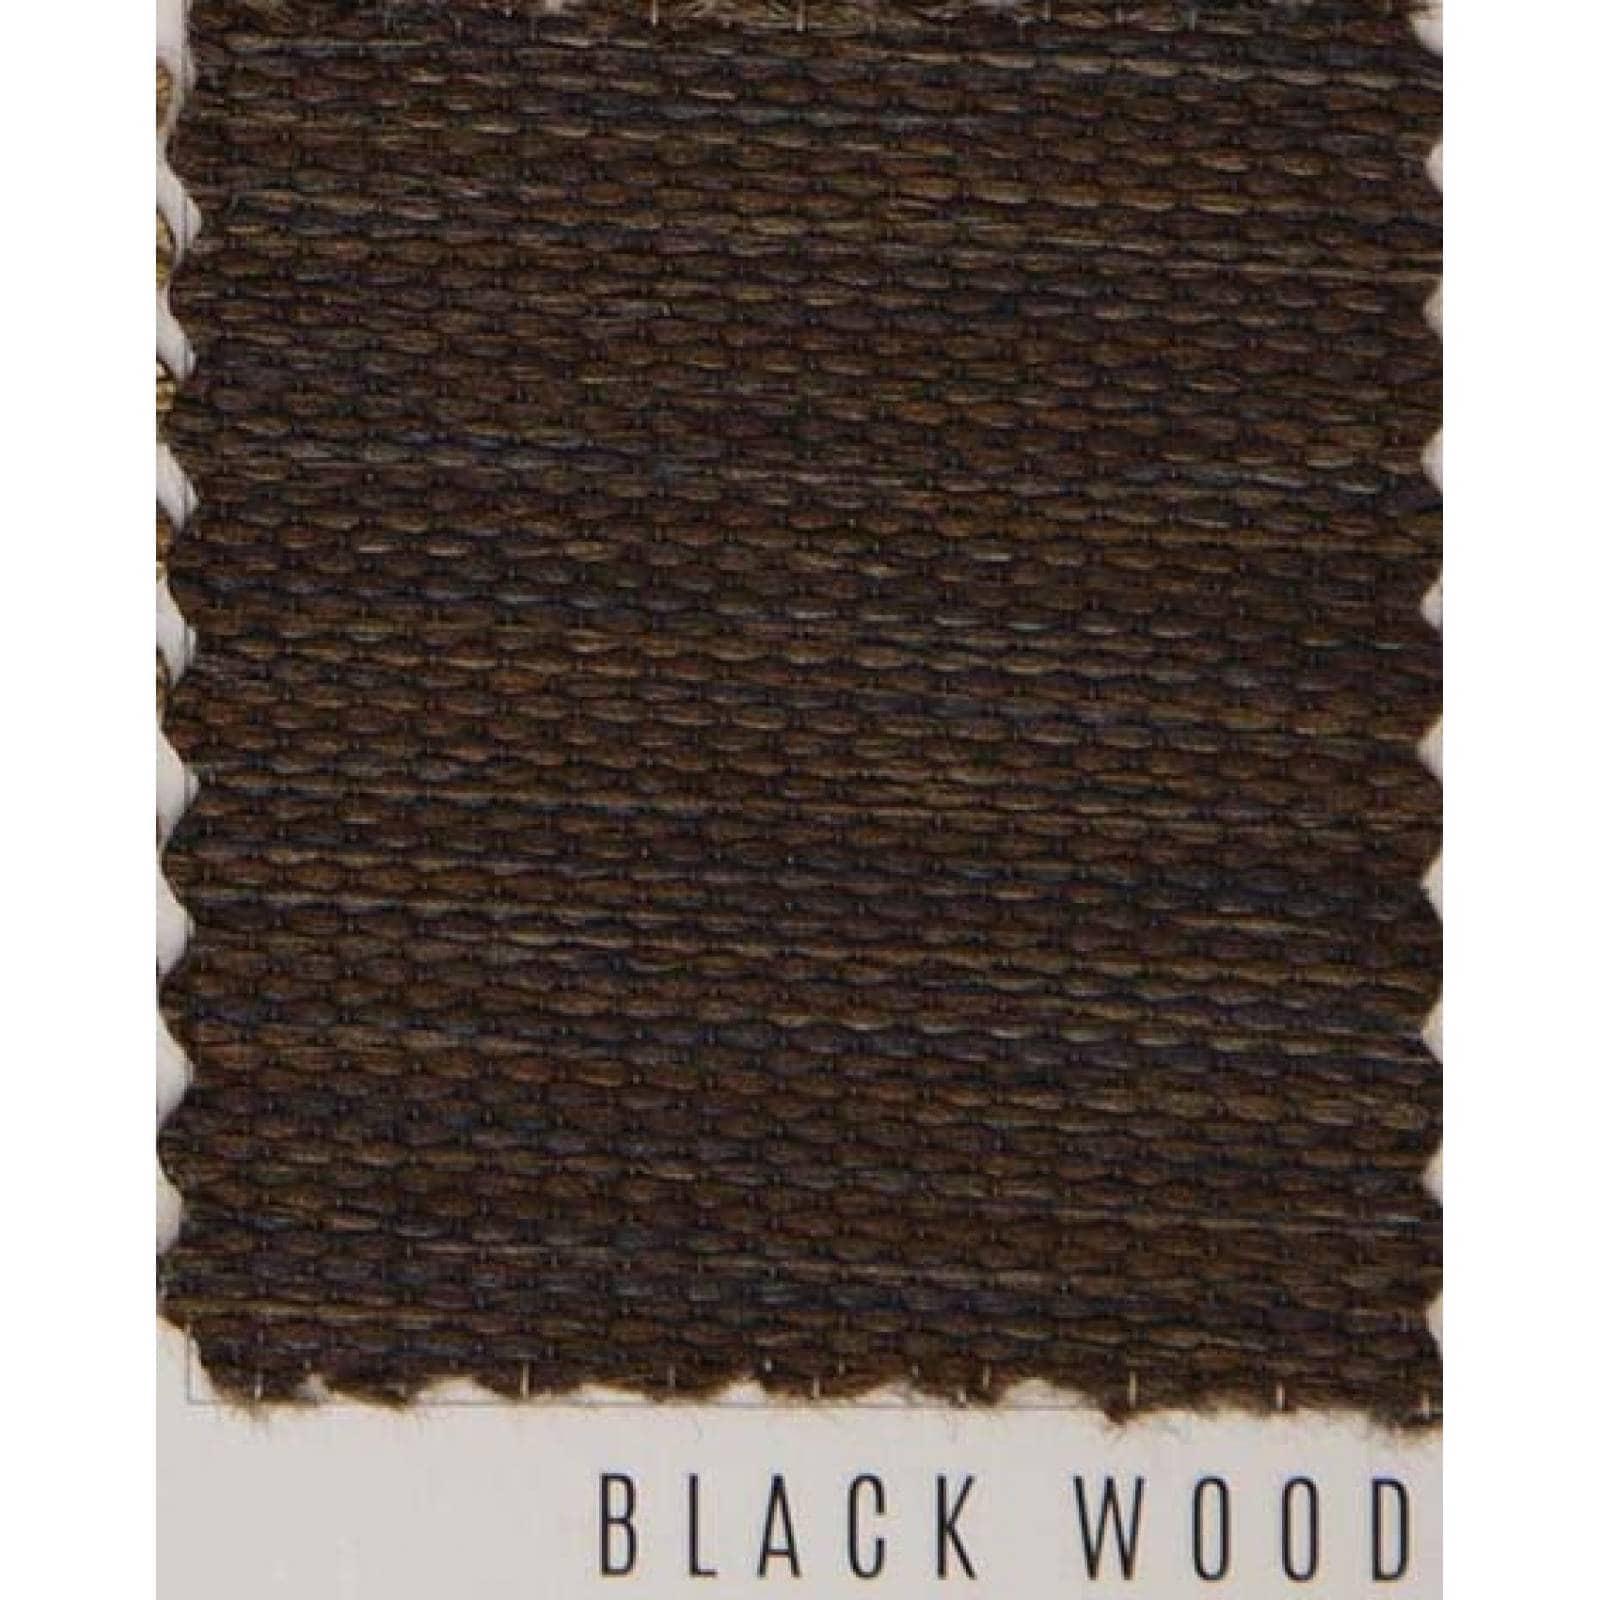 Persianas Sheer Elegance modelo Wood line 100 cm de ancho X hasta 100 cm de largo